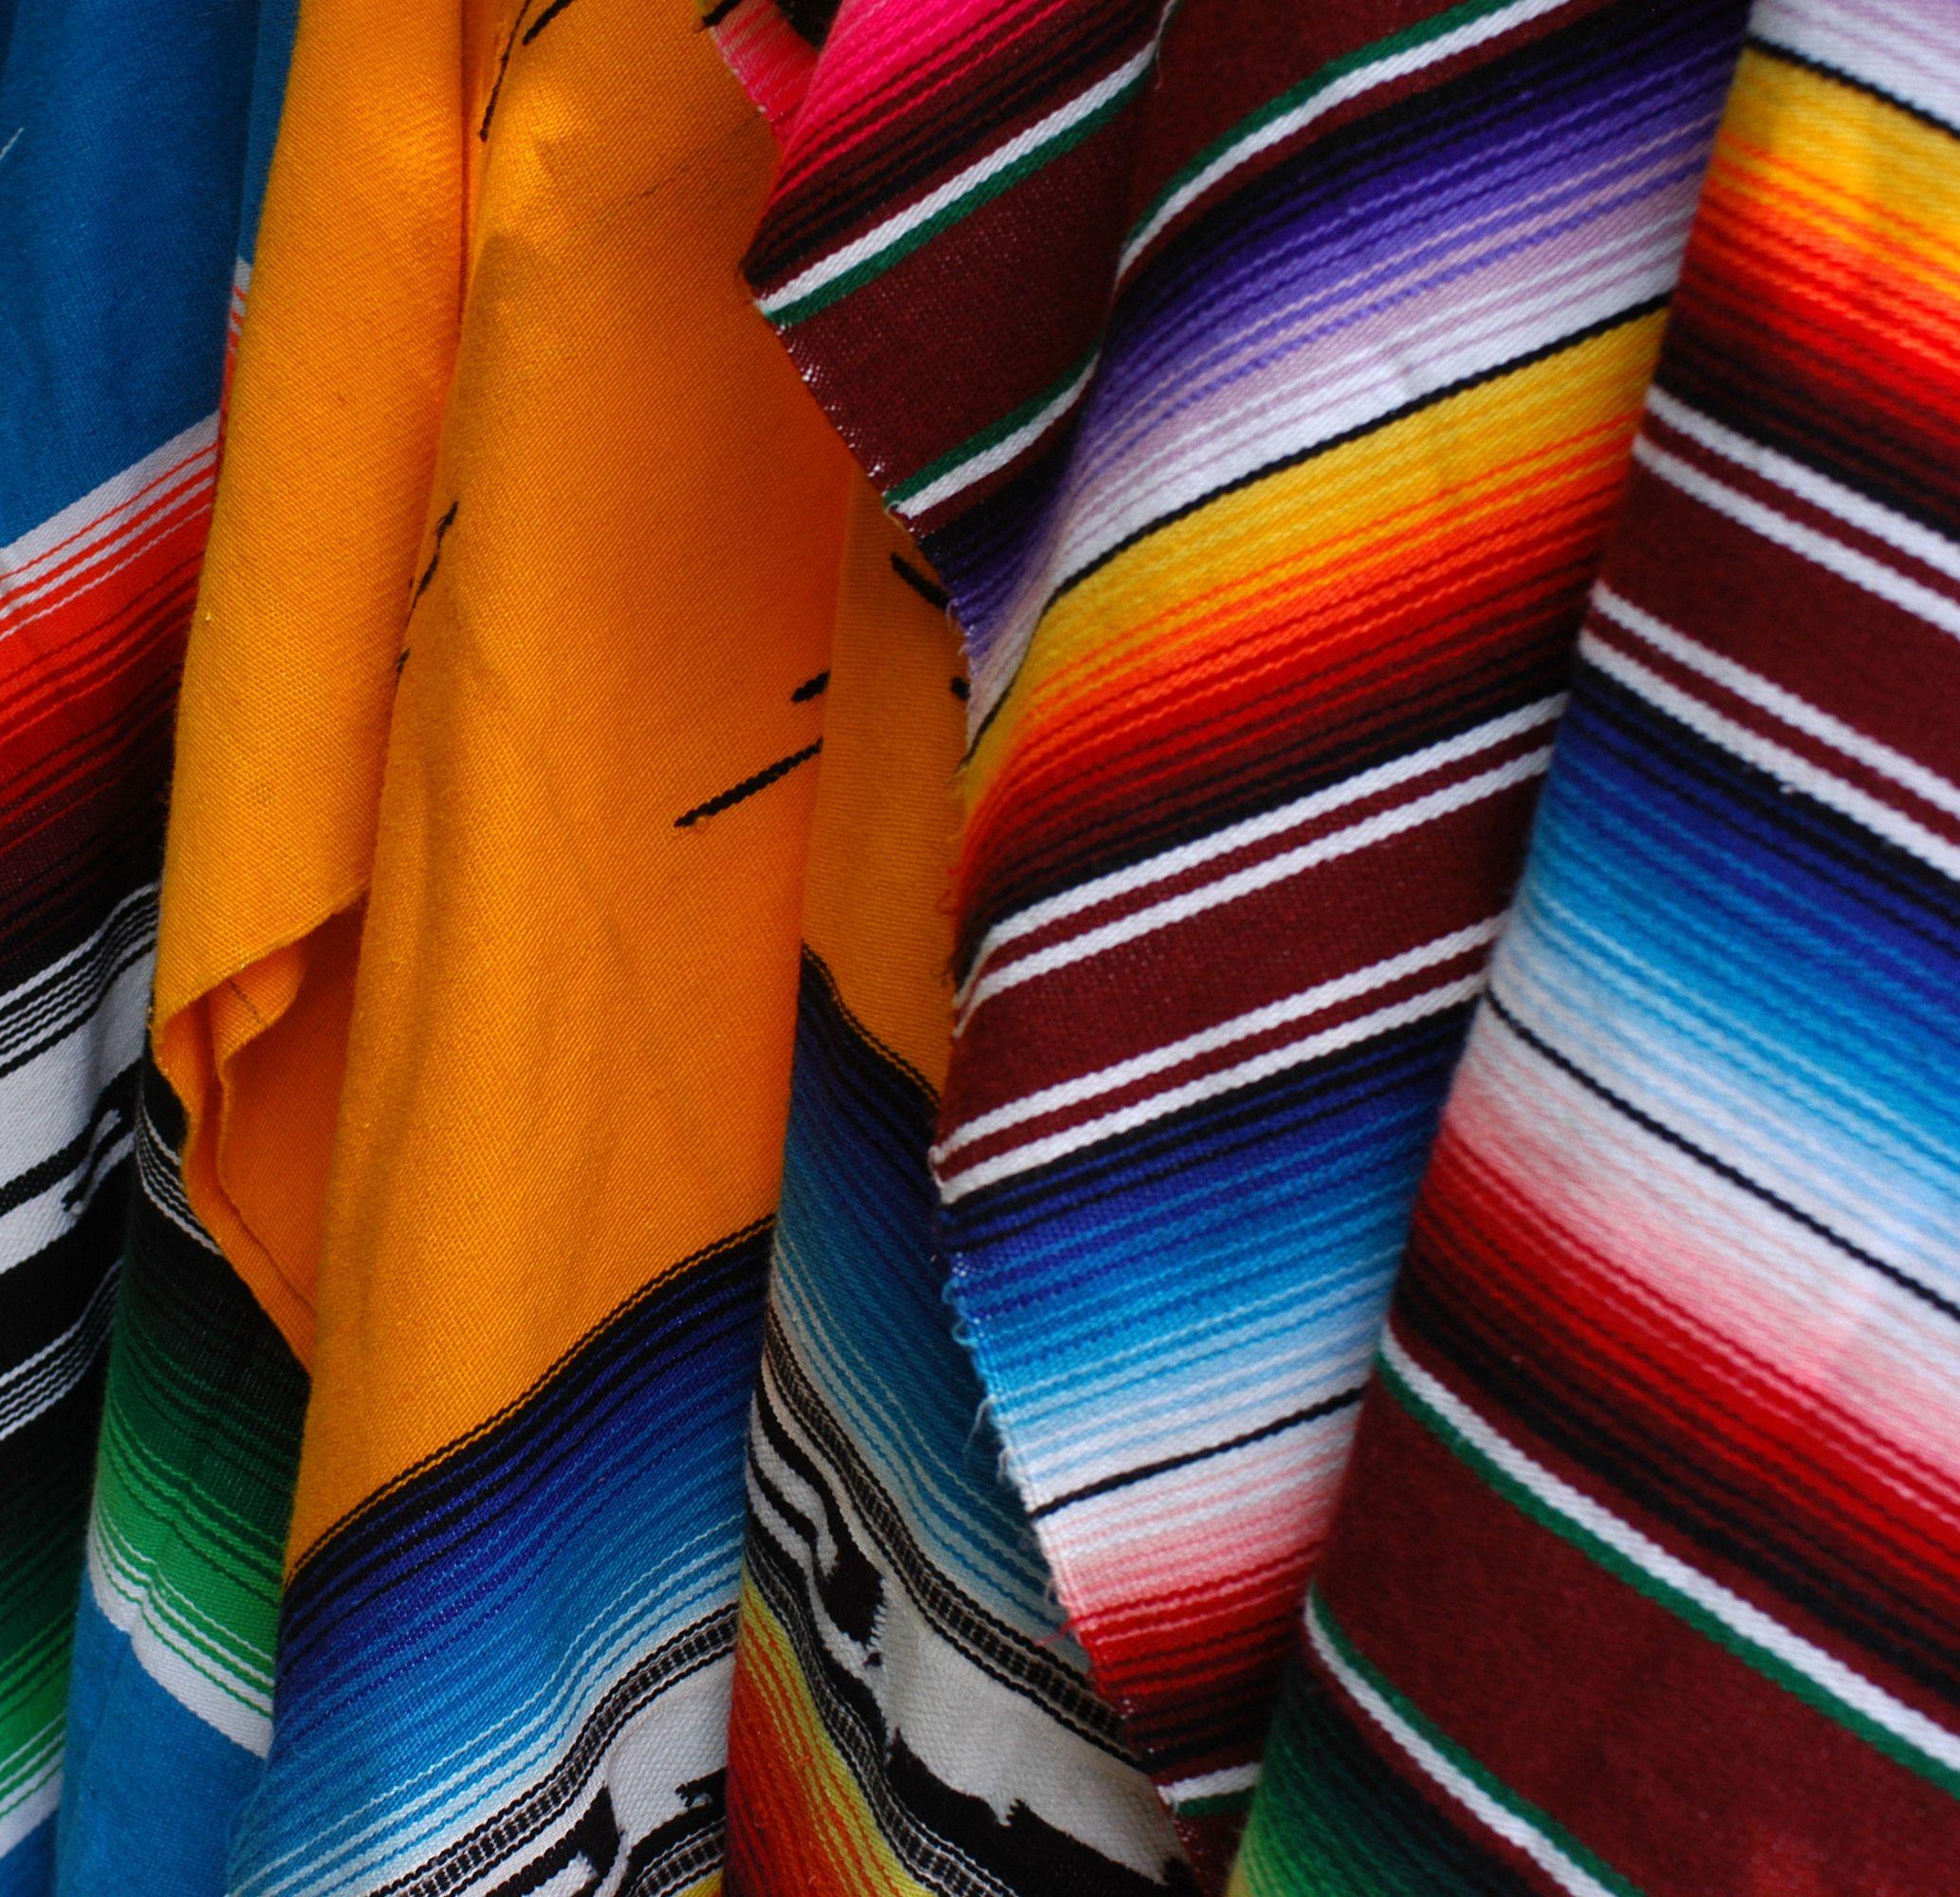 Típicos coloridos ponchos mexicanos. | Aventura y Naturaleza